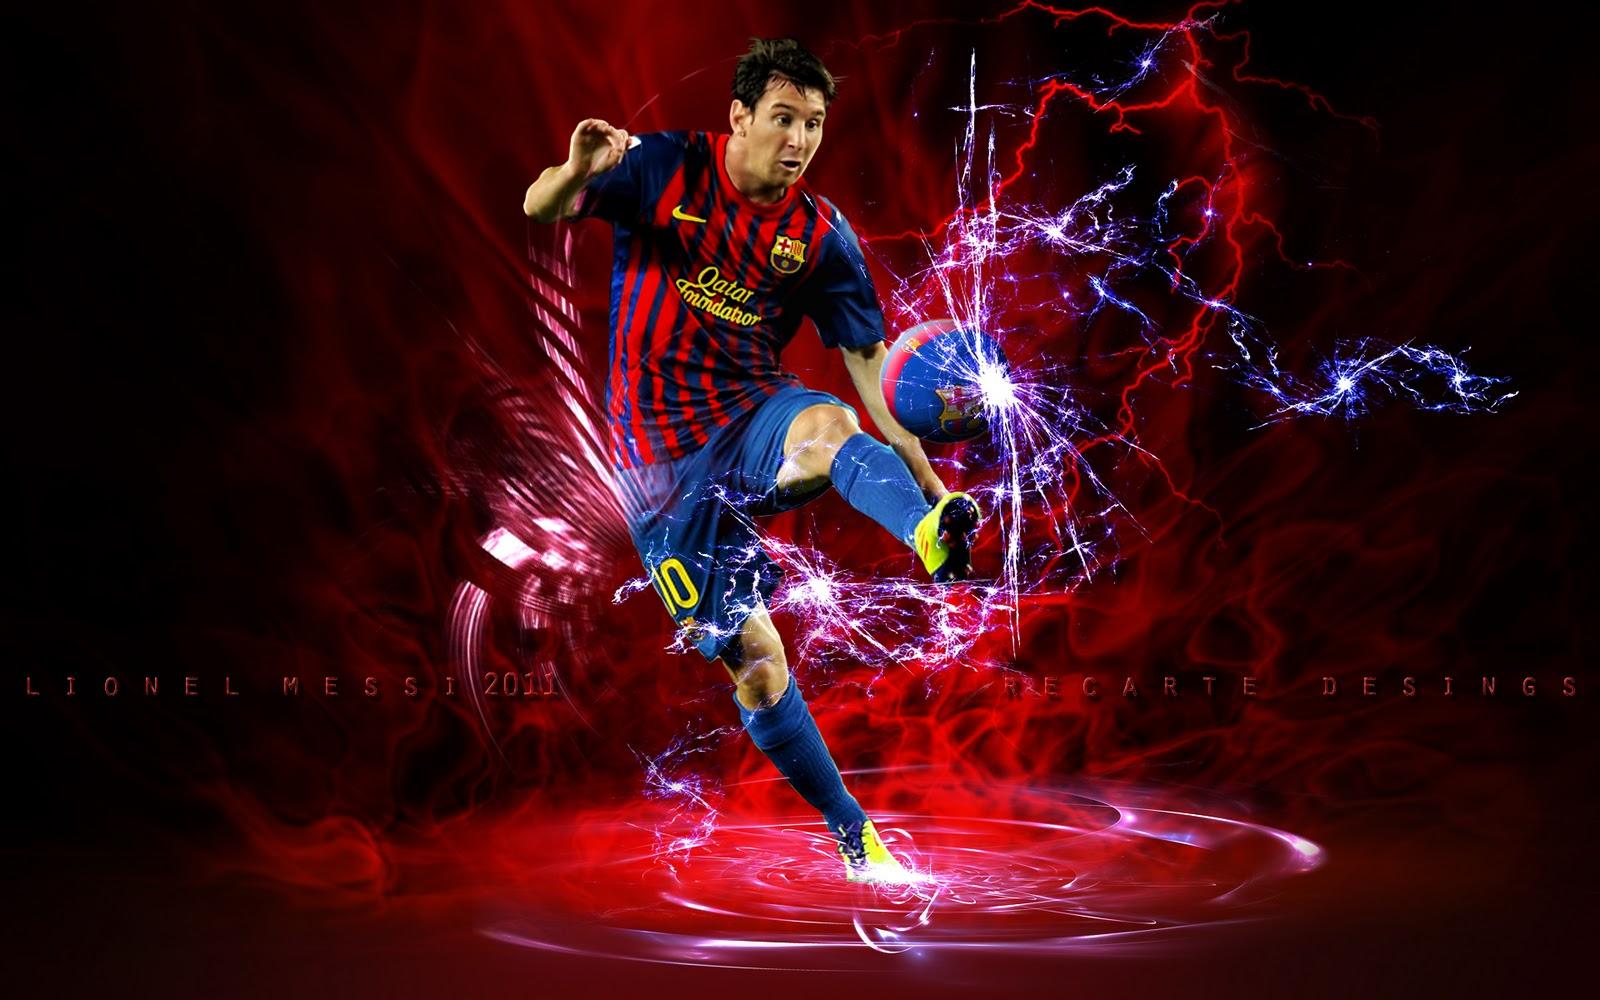 Lionel Messi Wallpapers Sportwallpapers 1600x1000